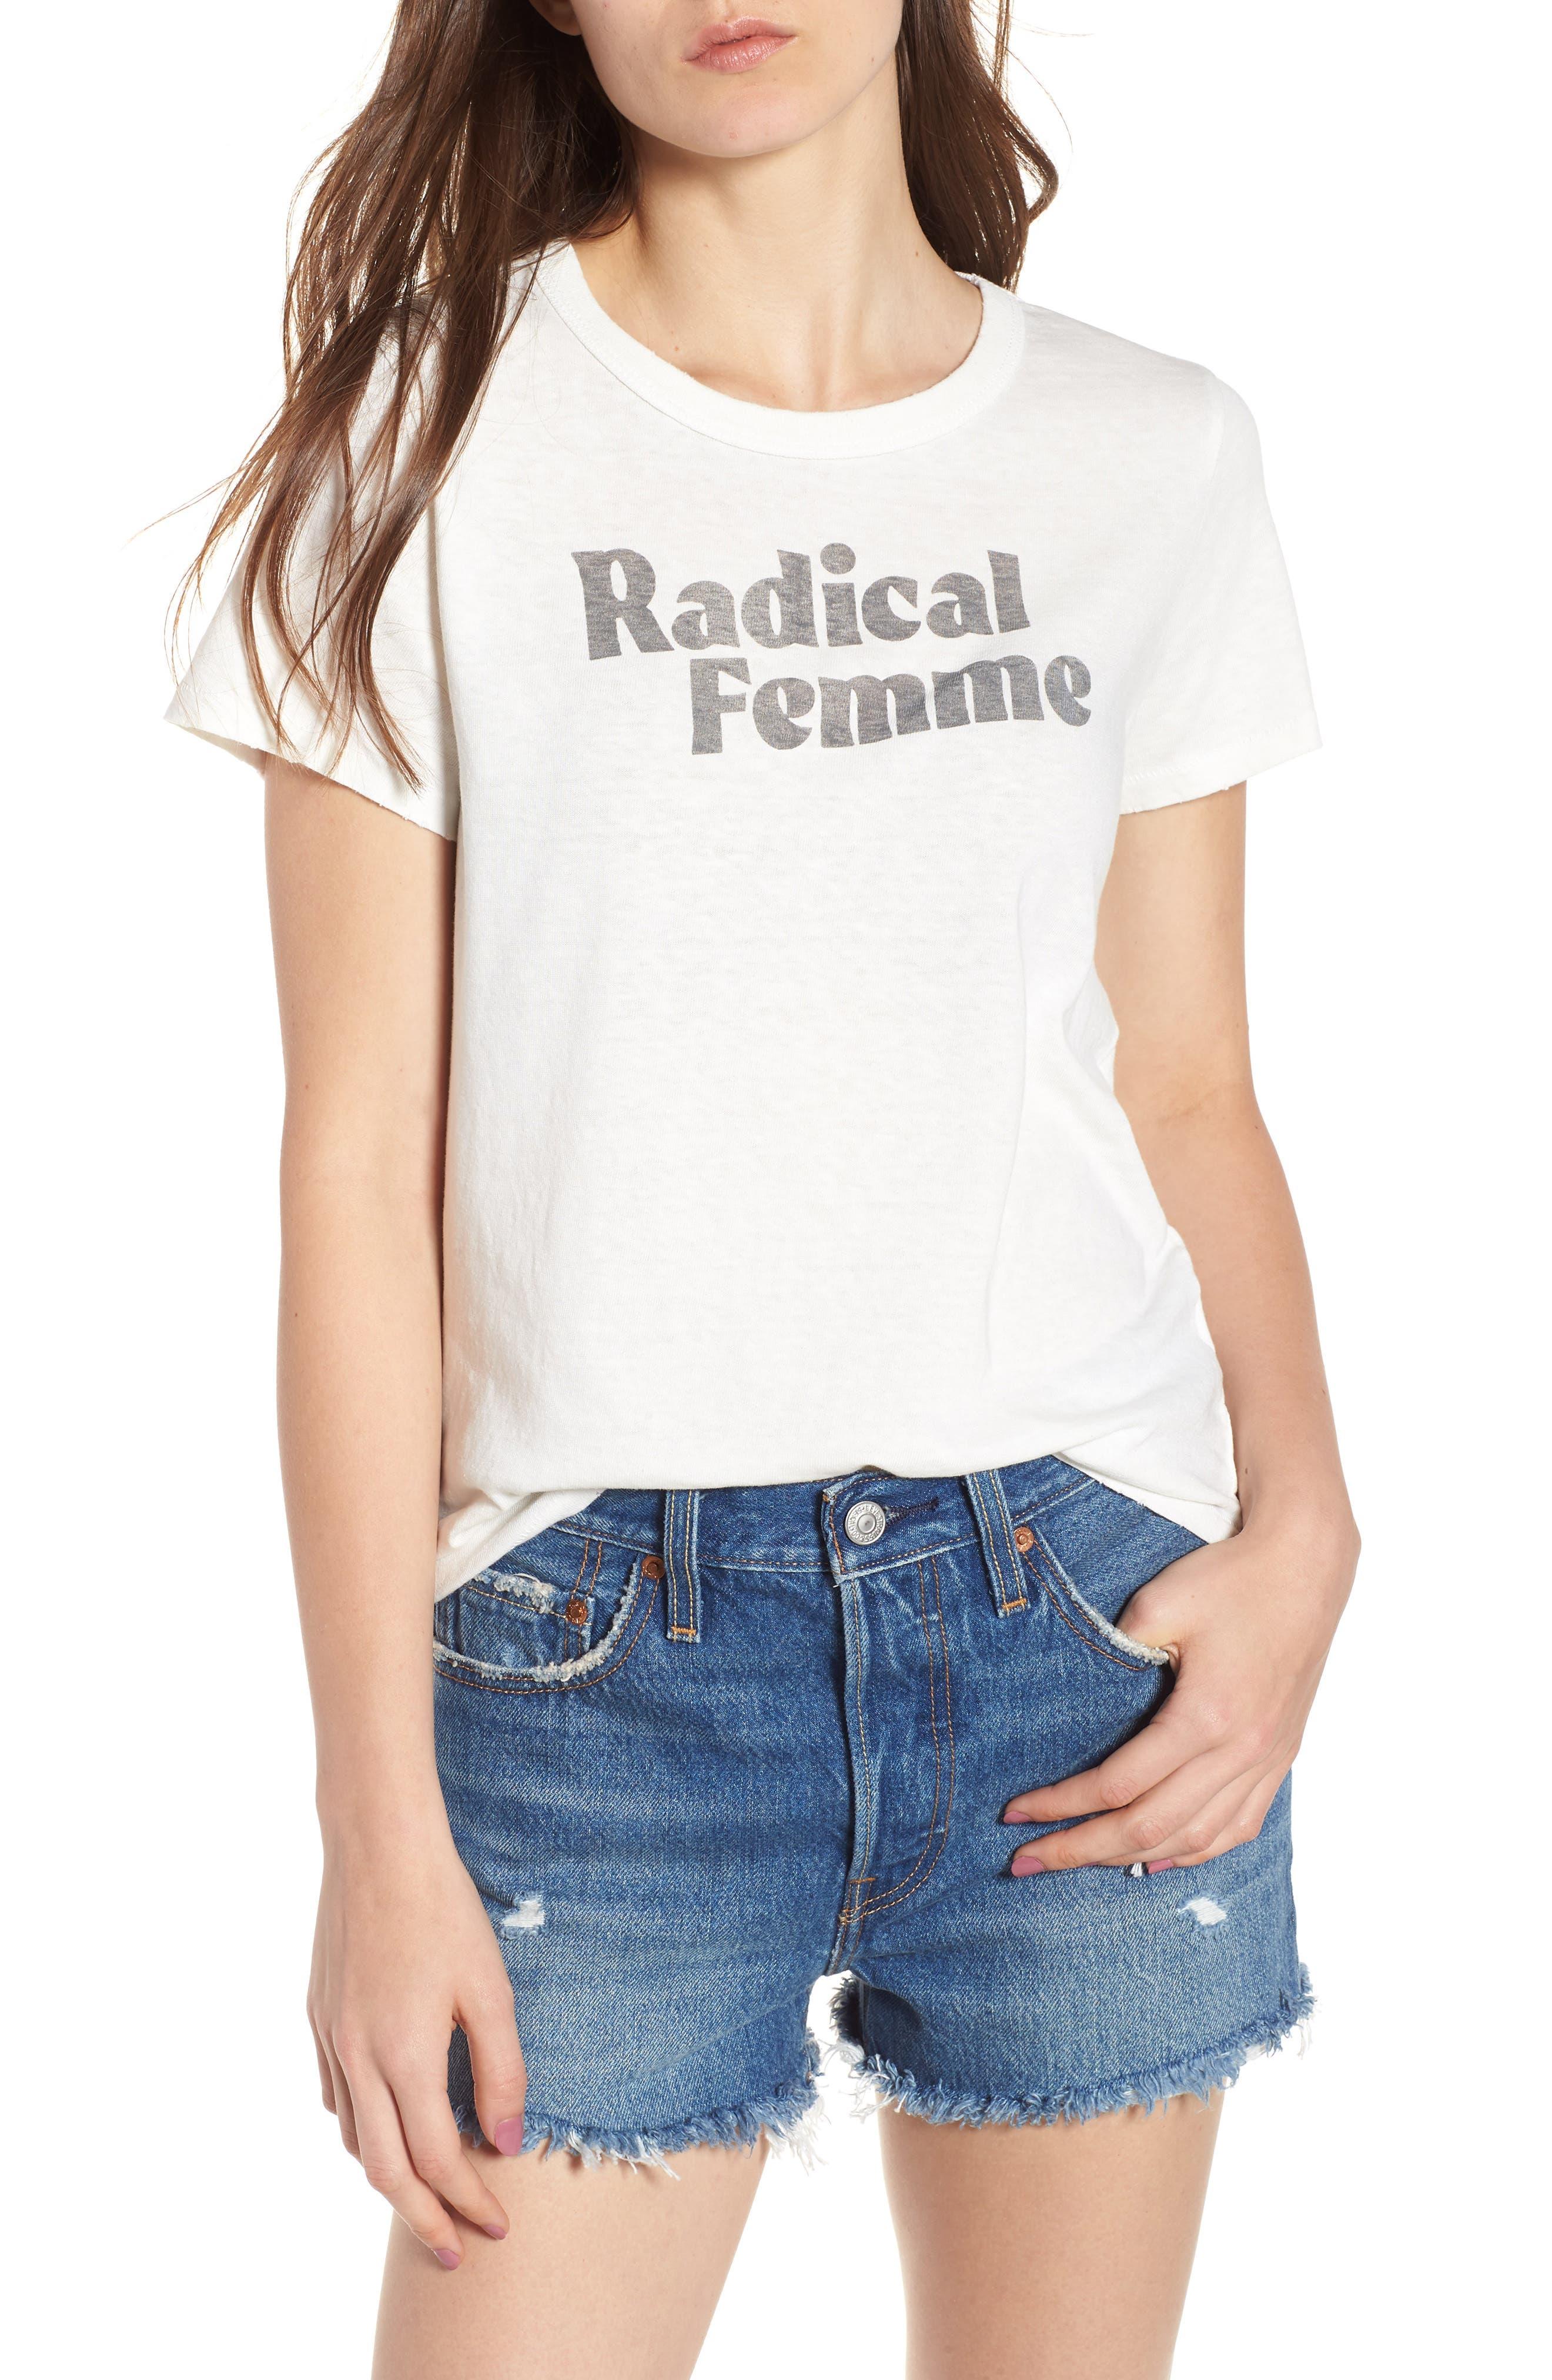 Radical Femme Tee,                             Main thumbnail 1, color,                             Vintage White